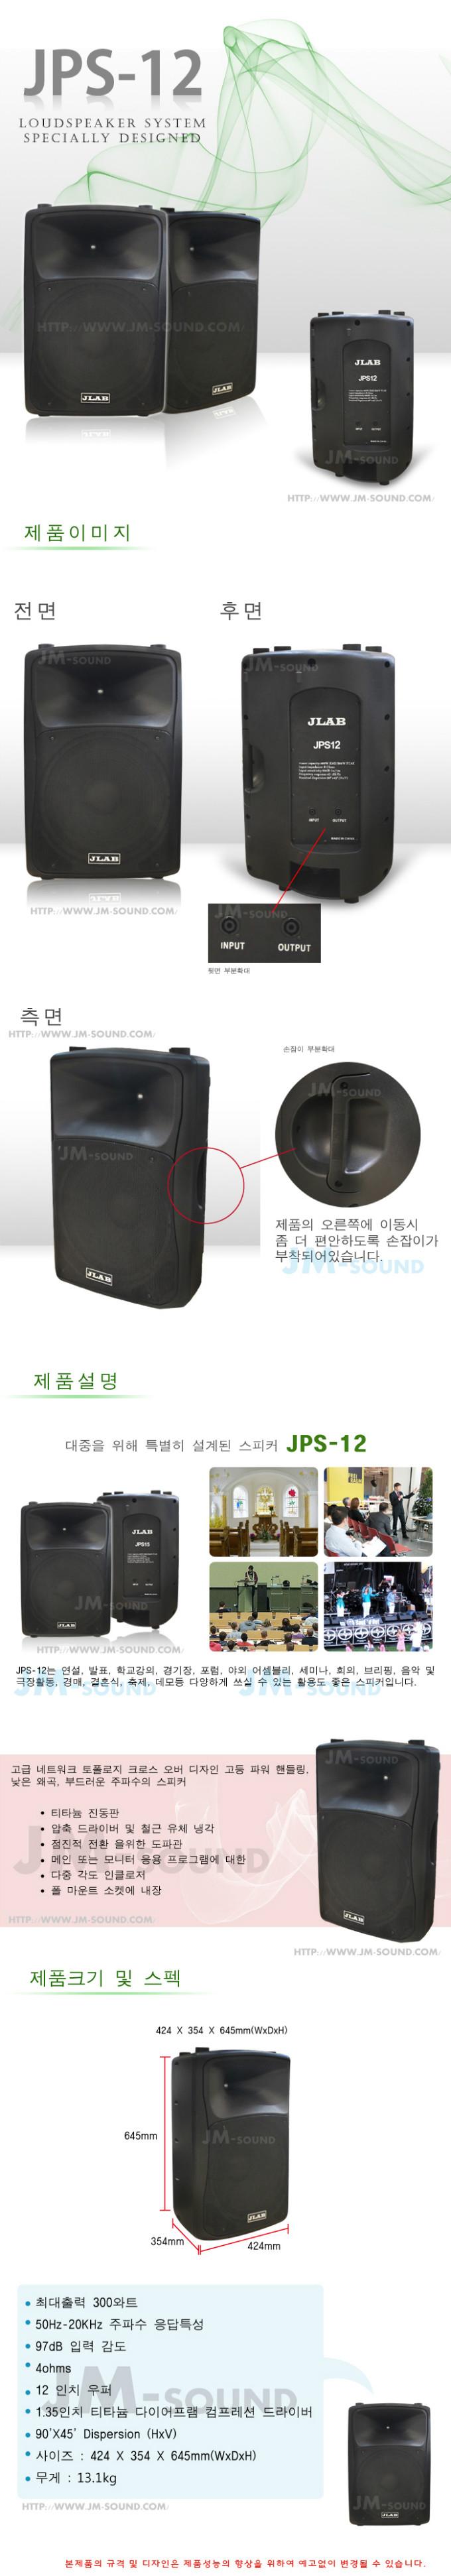 JPS-12-55.jpg